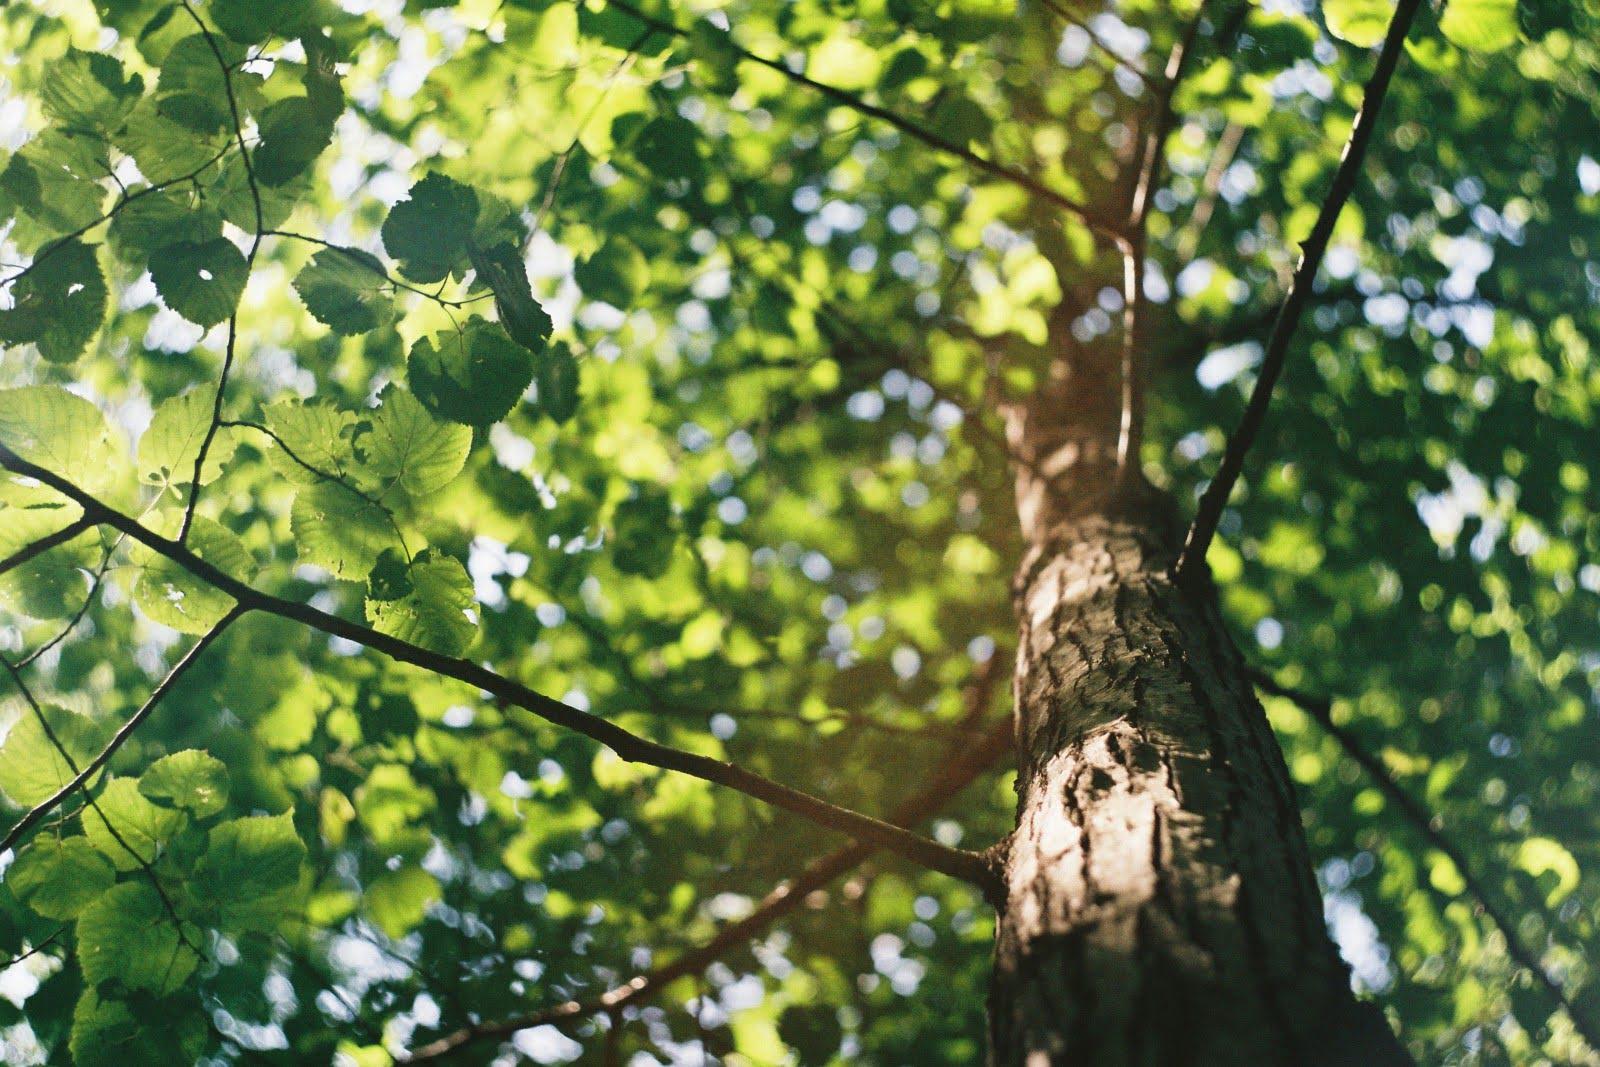 Sun-dappled tree